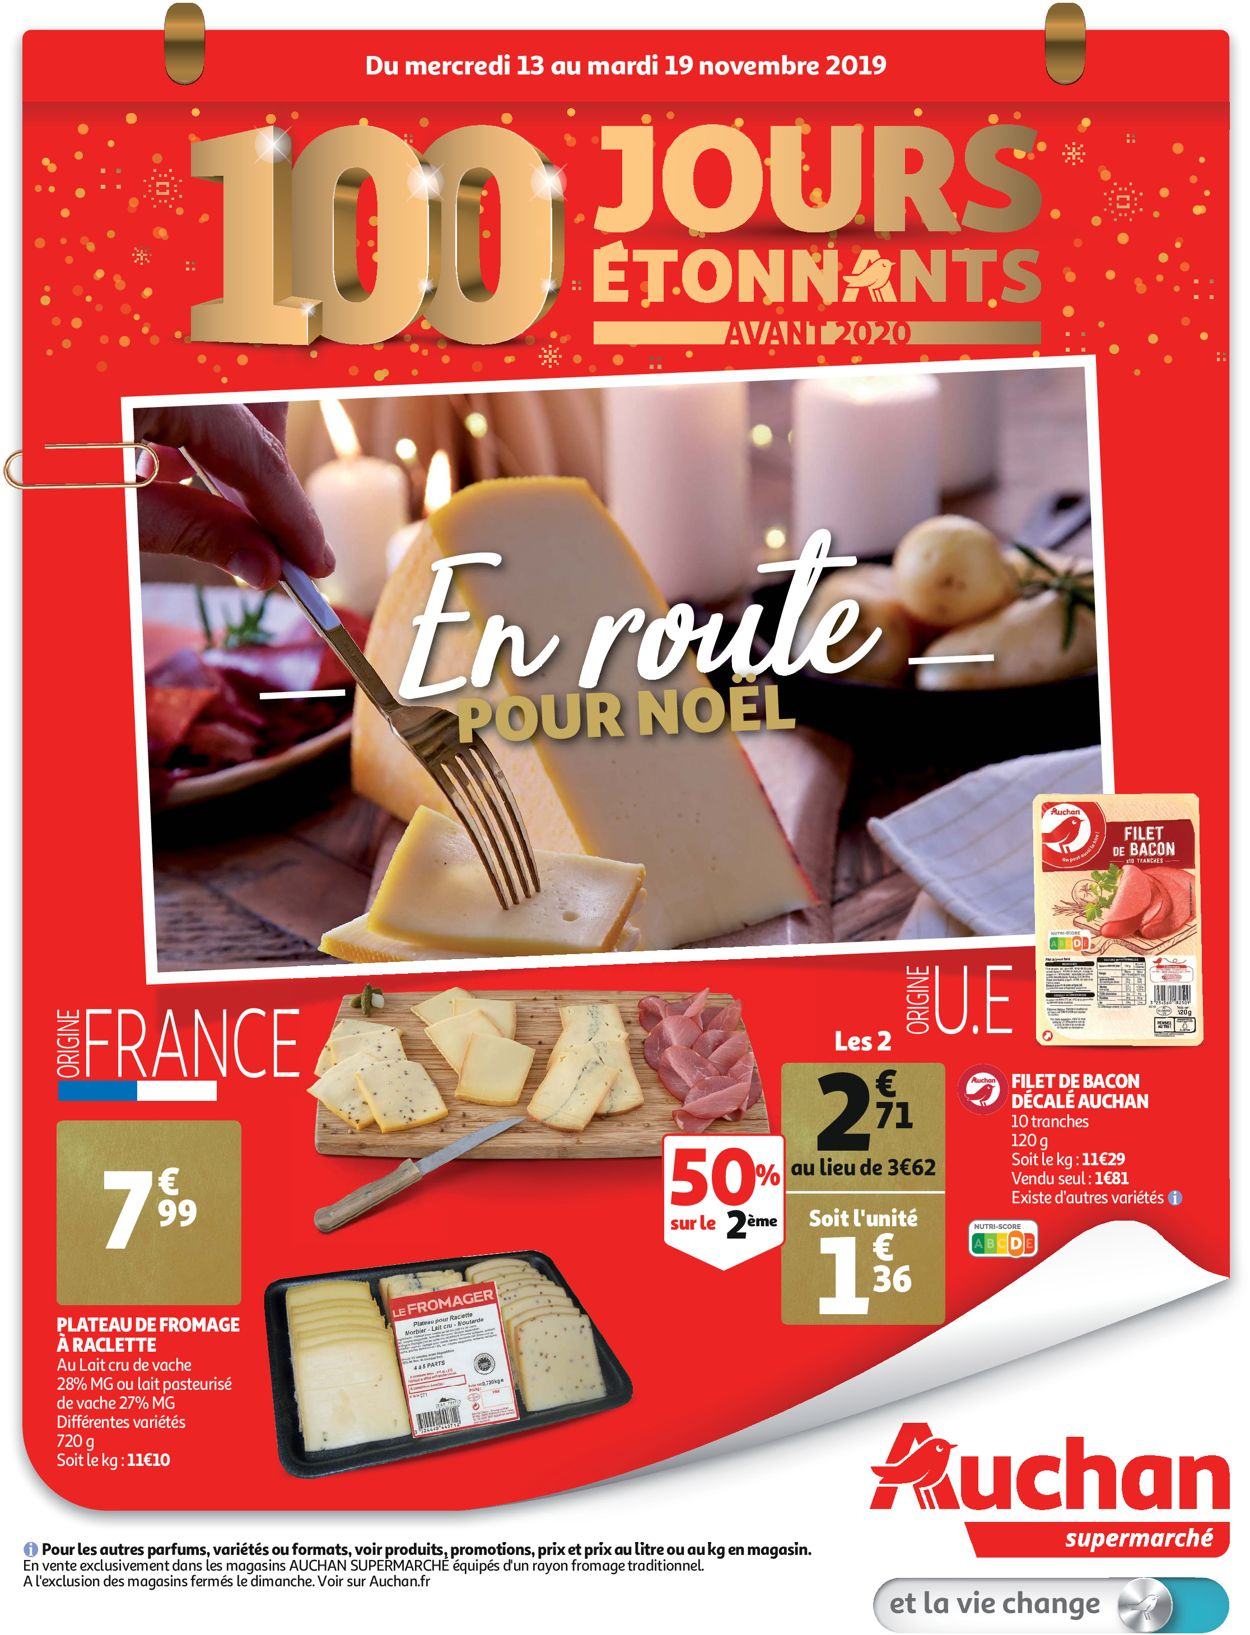 Auchan Catalogue - 13.11-19.11.2019